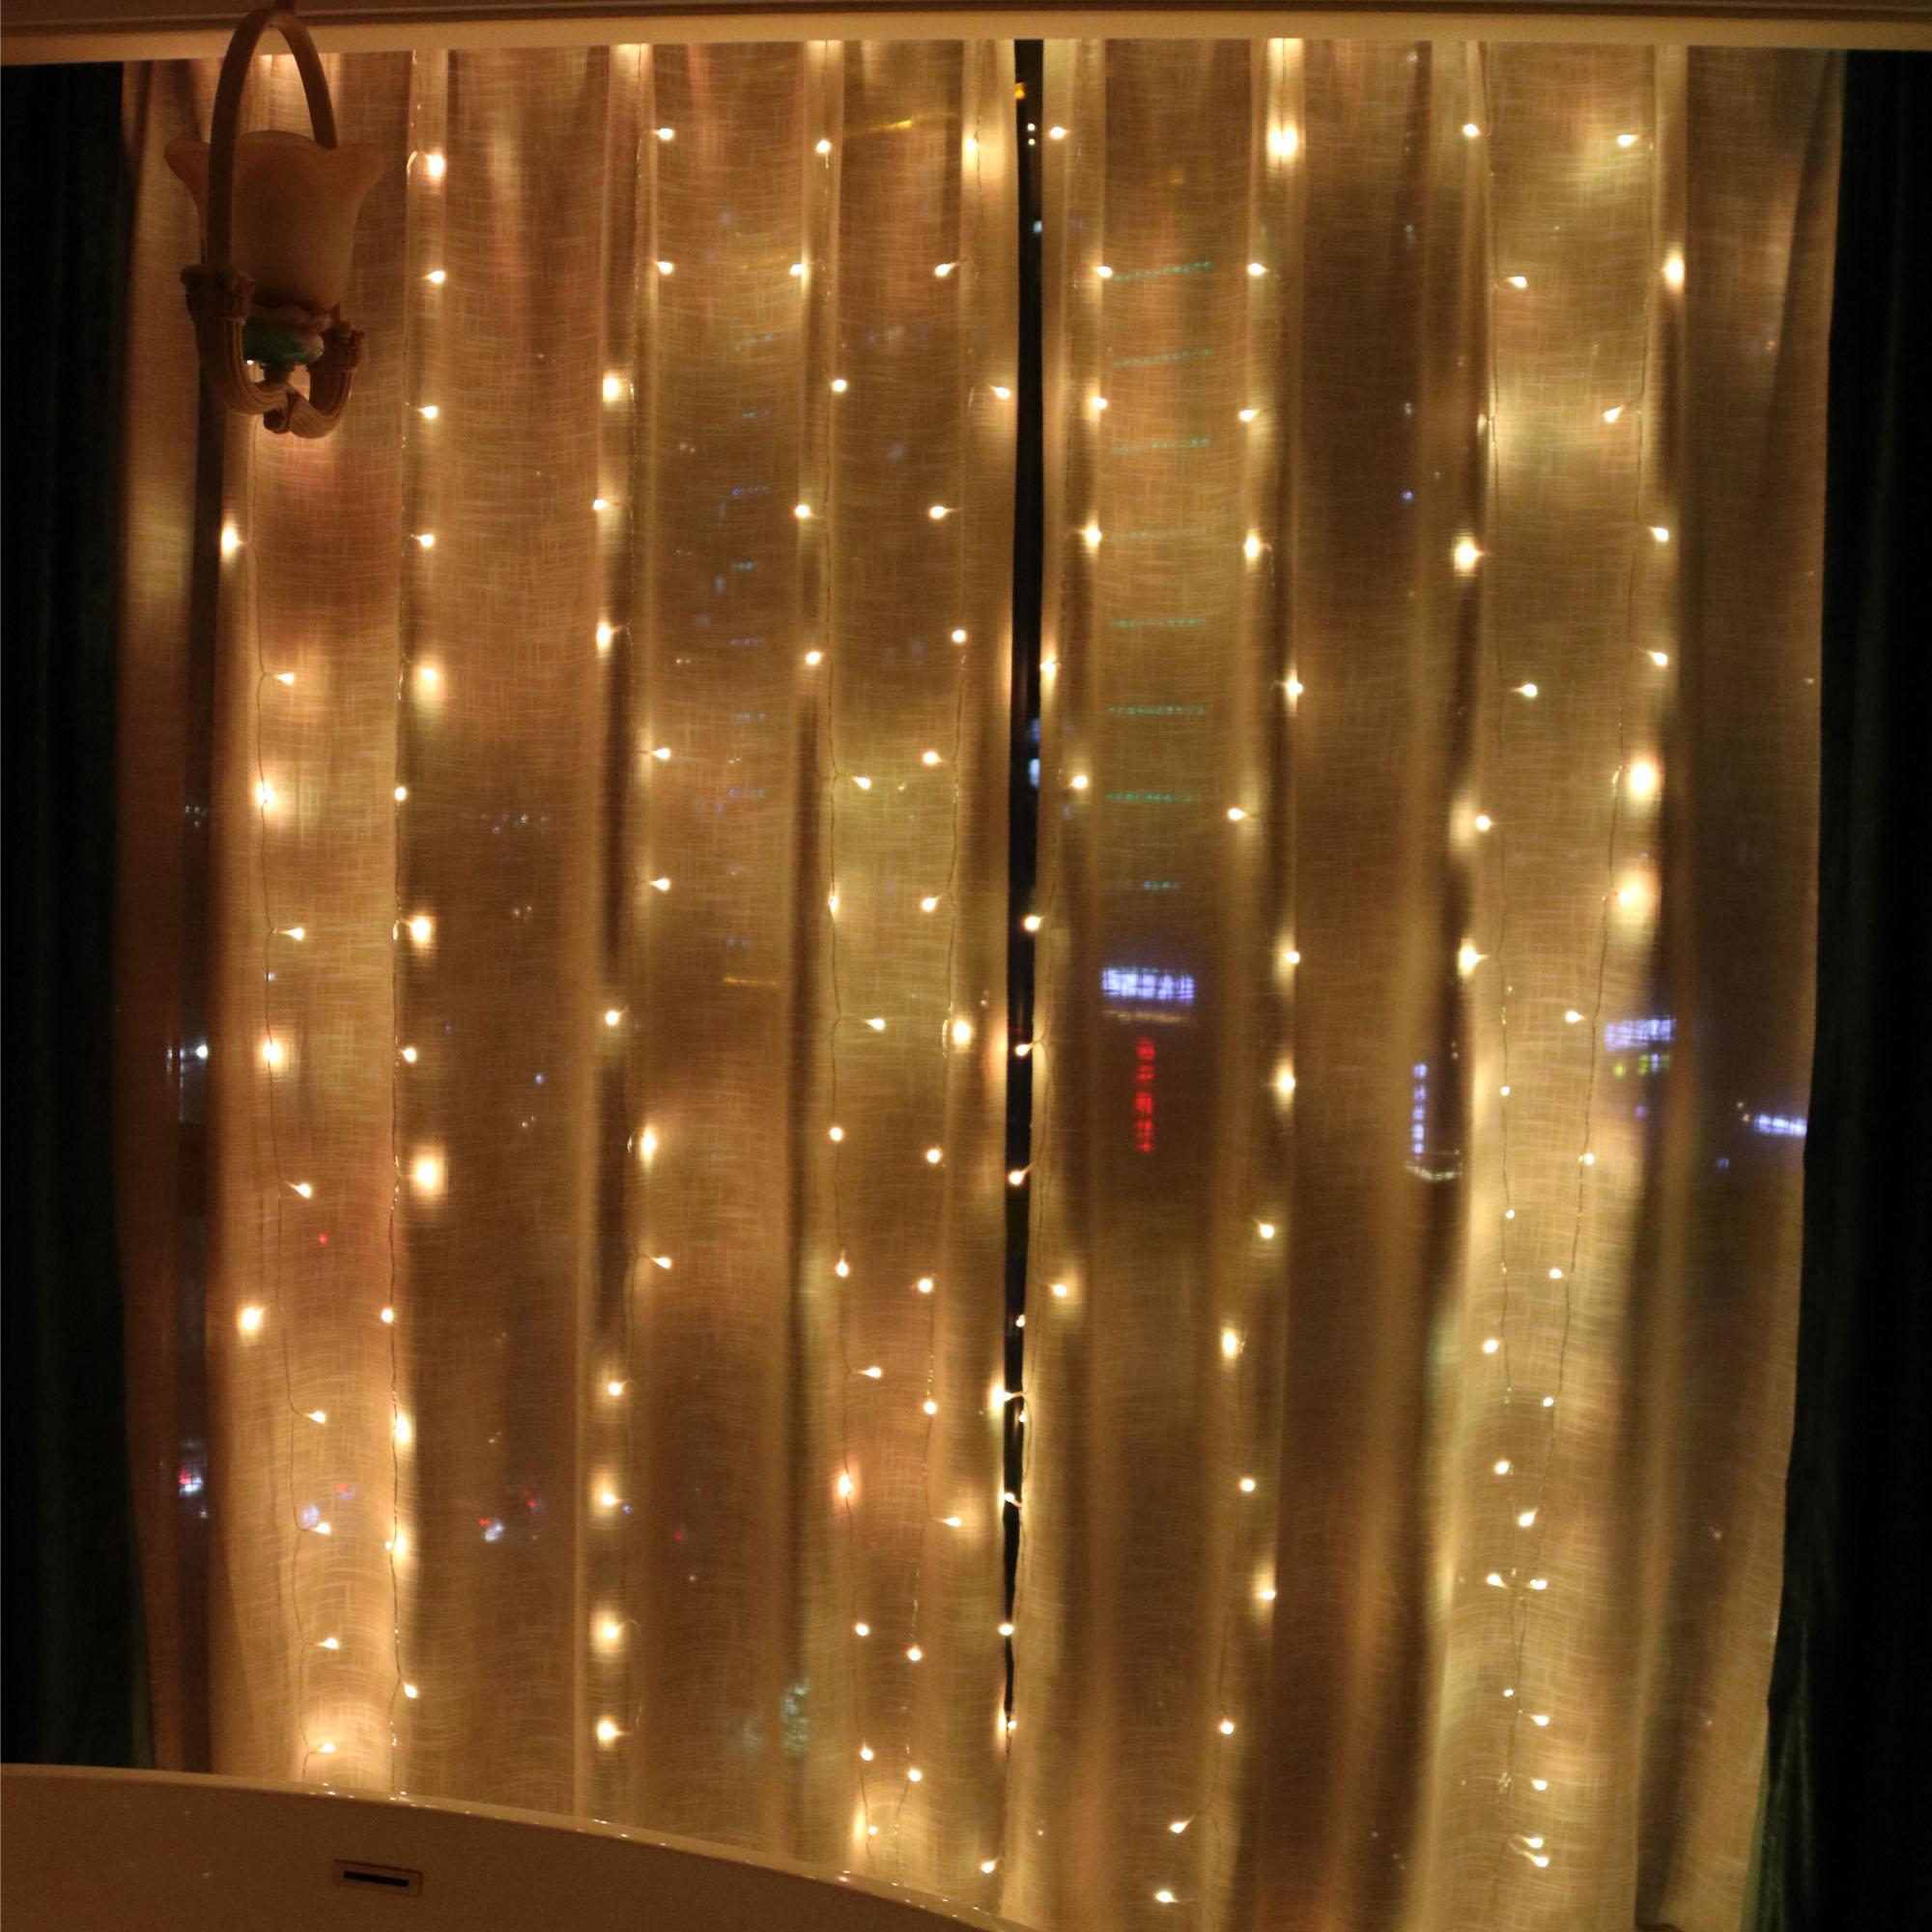 Amazon 300 LEDウォームホワイト8モードChristmas Icicle Fairy Twinkle窓カーテンストリングライト